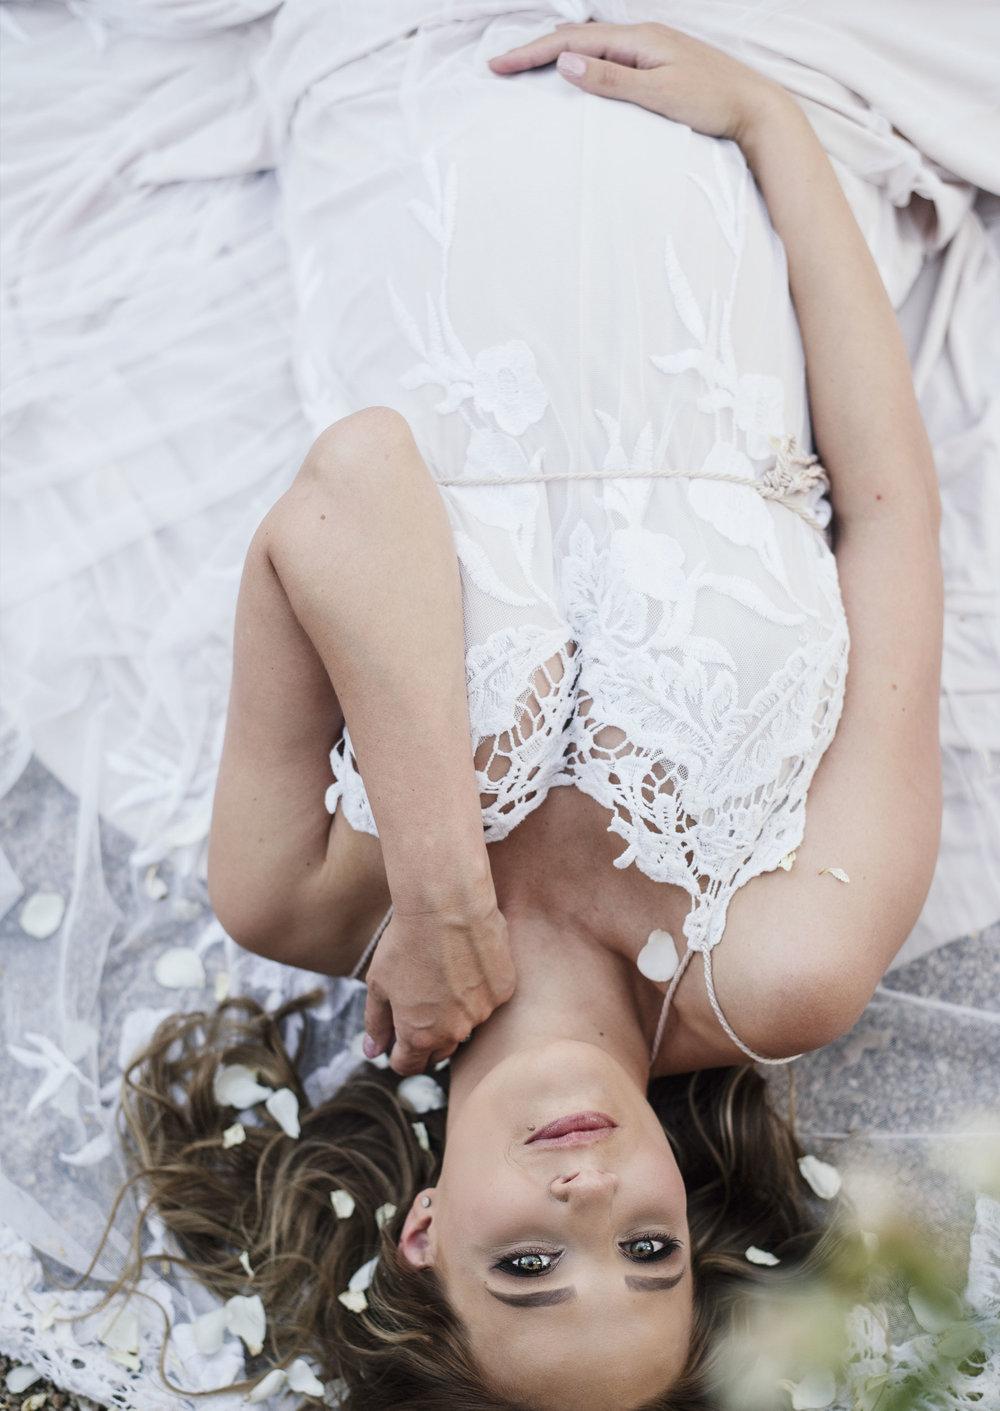 Chanel-Oosthuizen-Photography_viv&natasha_009.jpg